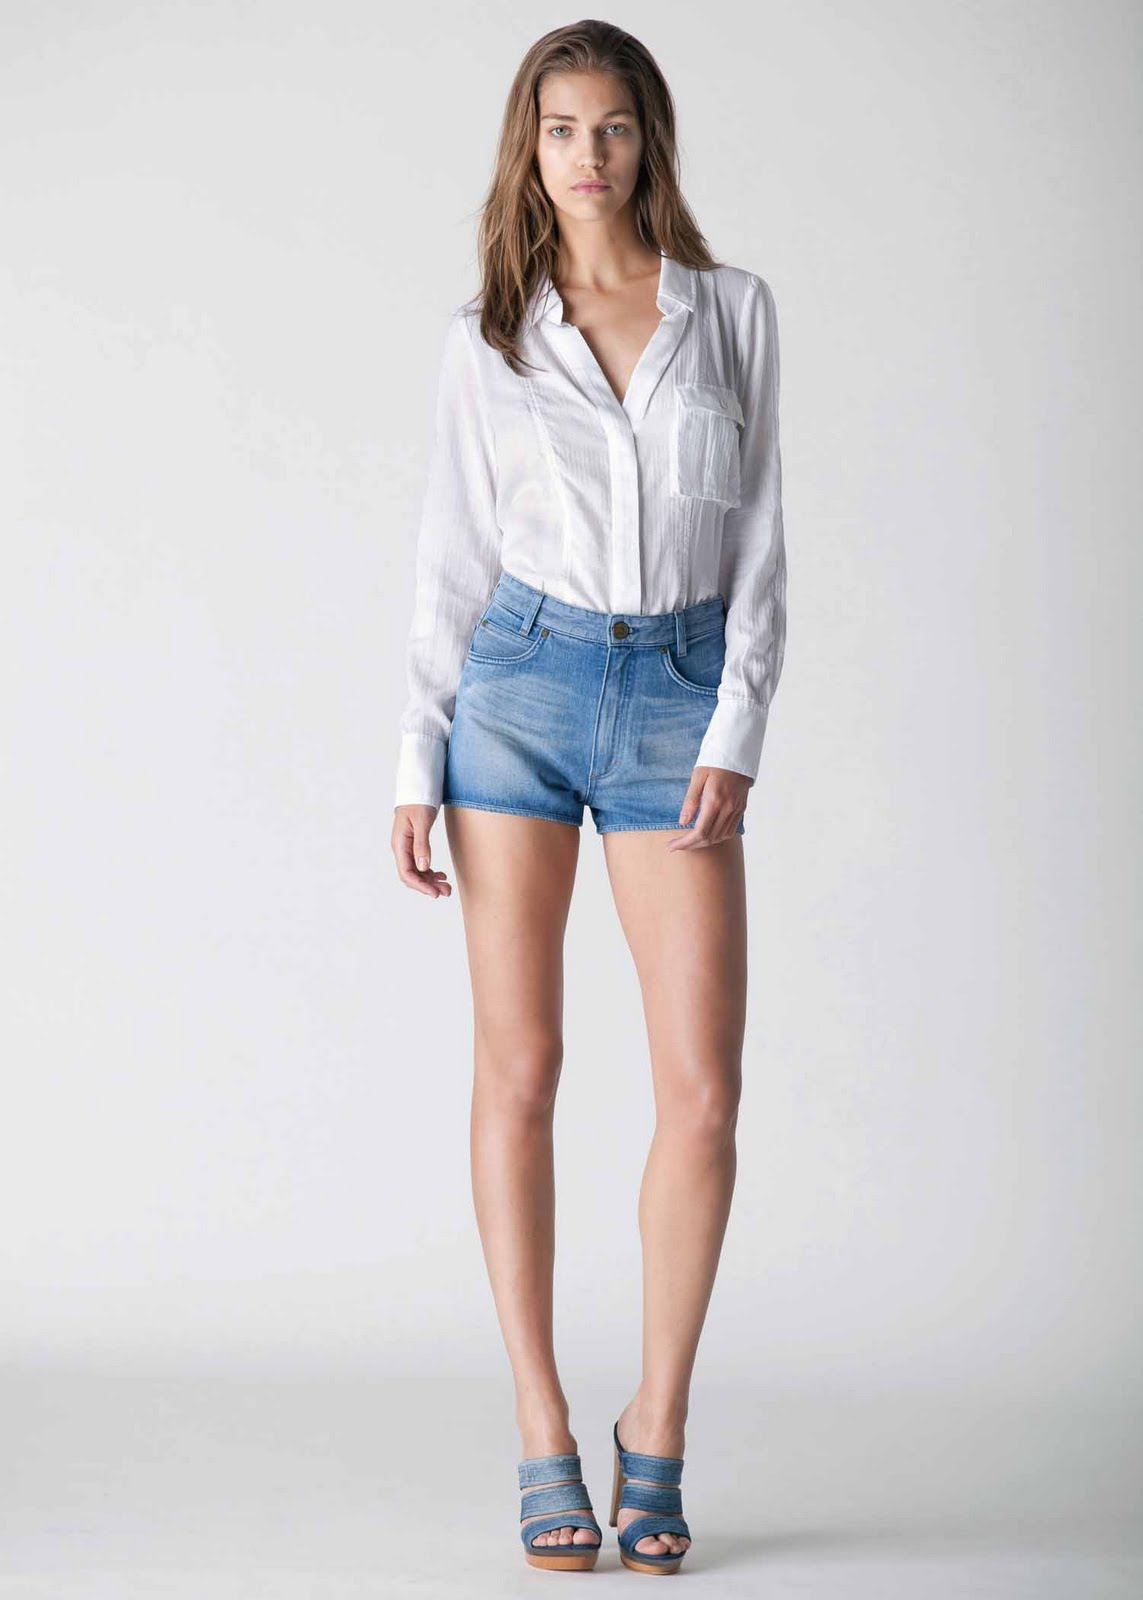 Model 10 Summer Ready Denim Shirts For Women  The Jeans Blog